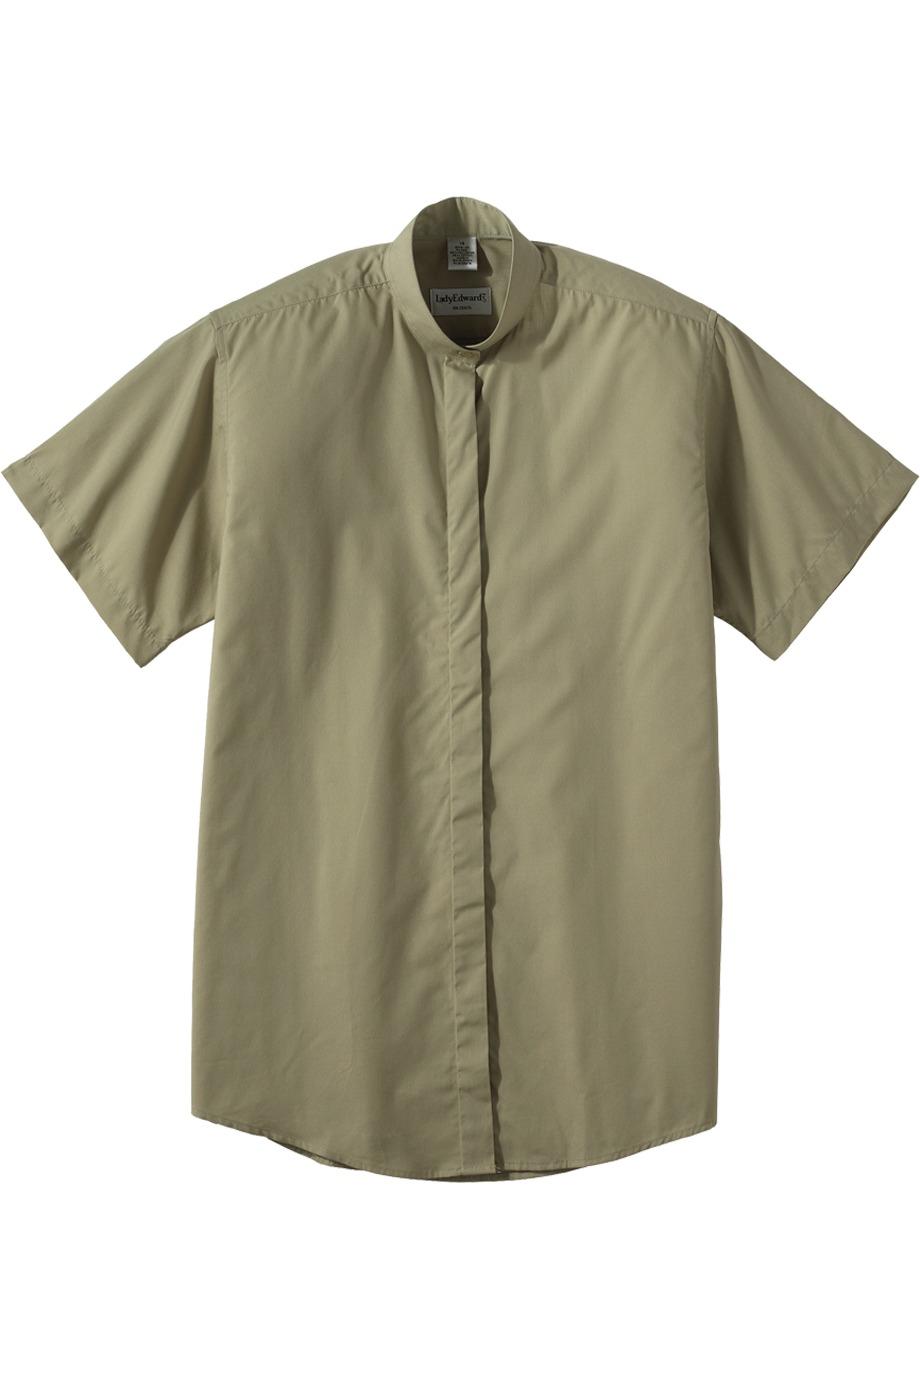 Edwards Garment 5346 女士短袖衬衣T恤